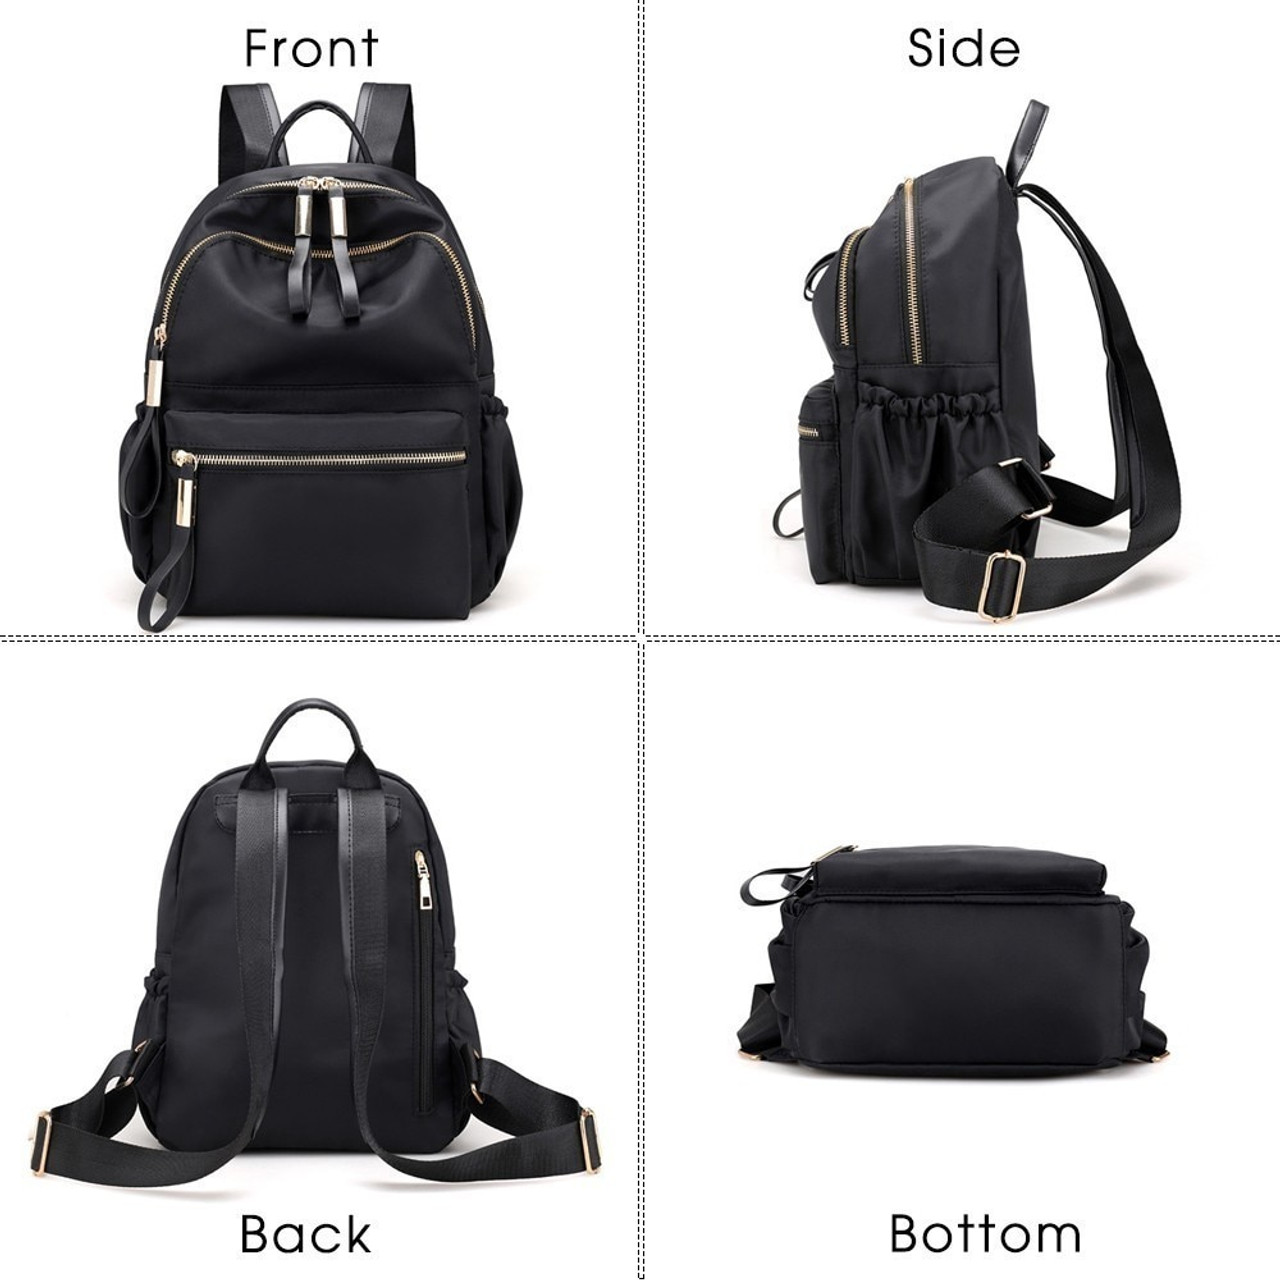 cbcf239b2bbf Herald Fashion Backpack Women Leisure Back Pack Korean Ladies Knapsack  Casual Travel Bags for School Teenage Girls Bagpack